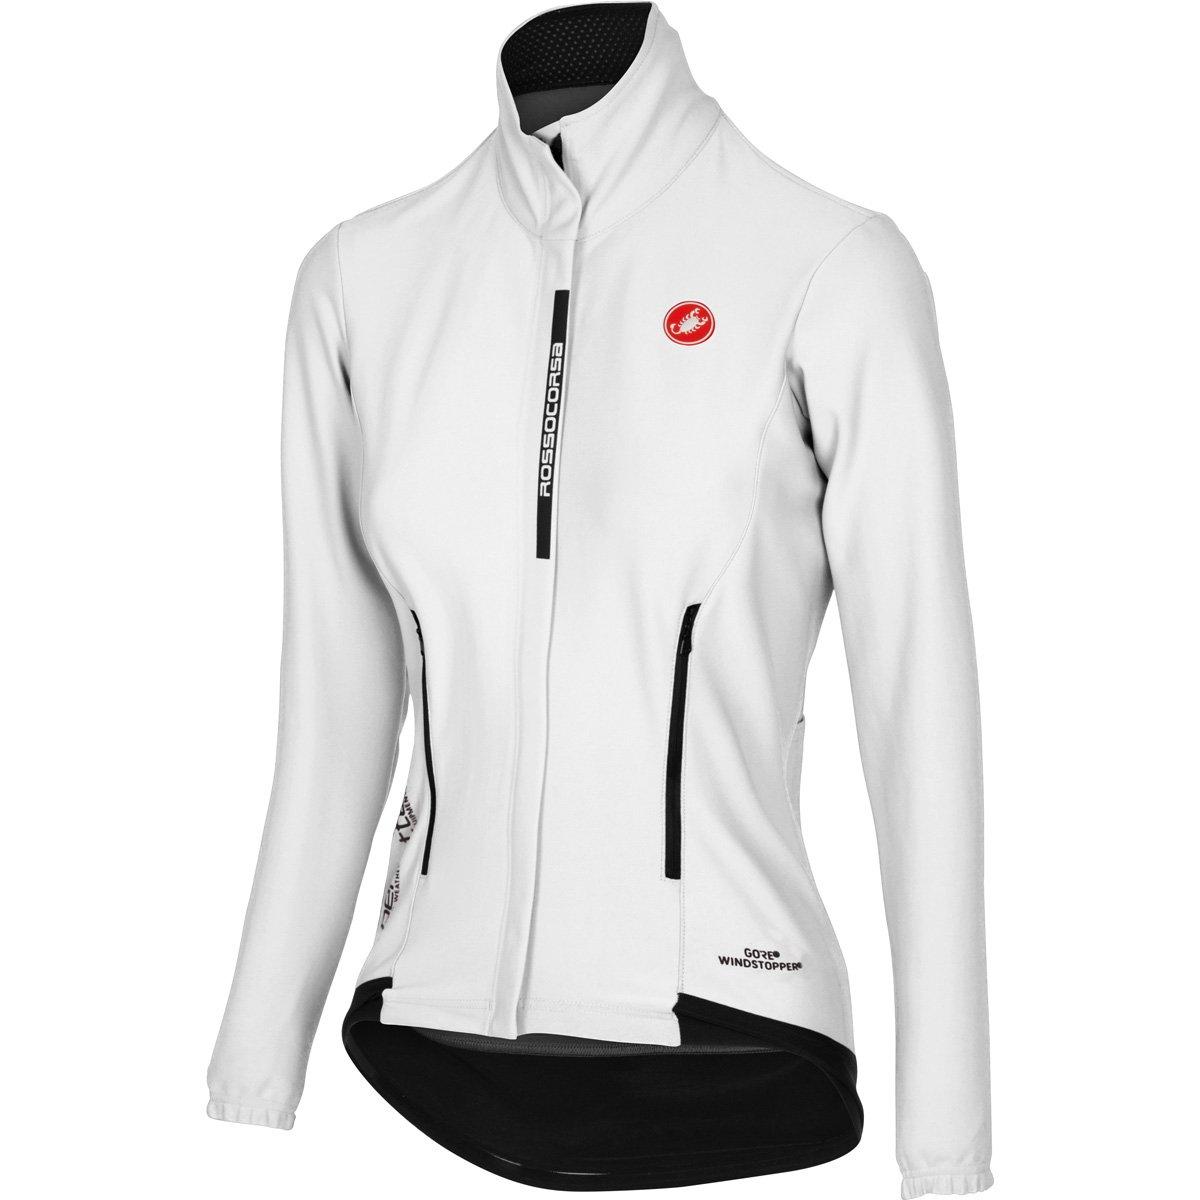 06cf02b90 Amazon.com   Castelli Perfetto Jersey - Women s   Sports   Outdoors